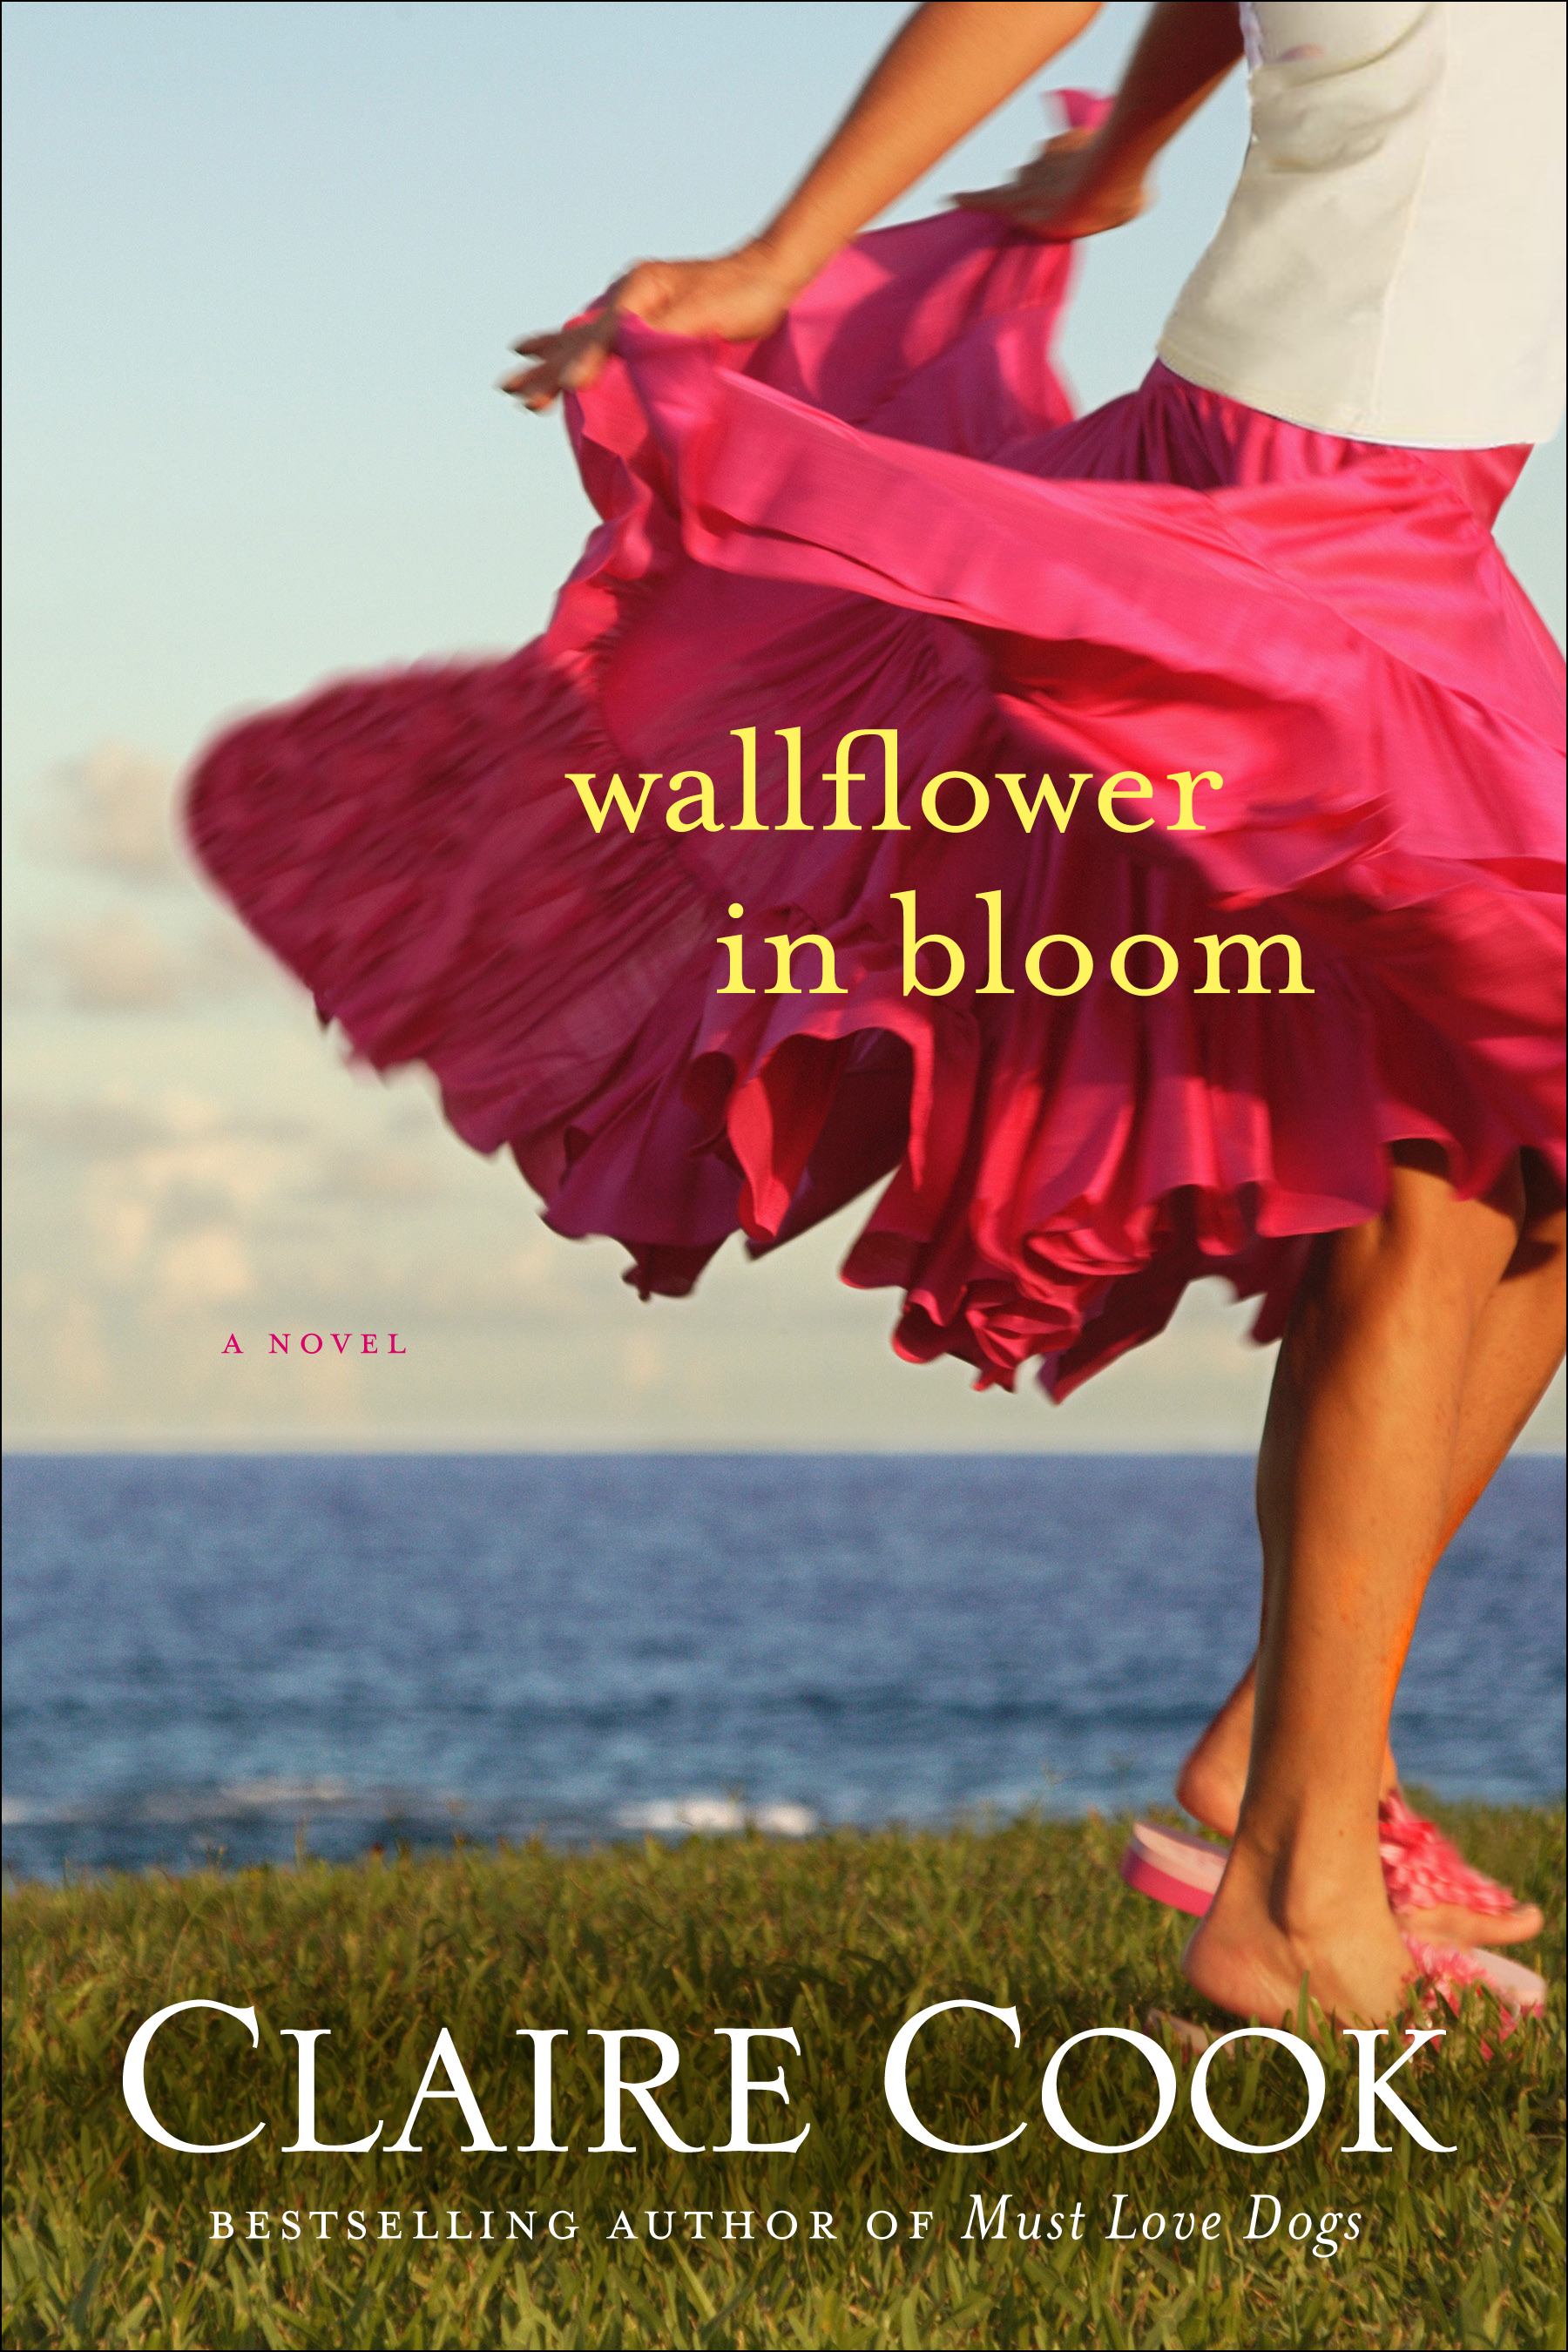 Claire Cook talks Wallflower in Bloom